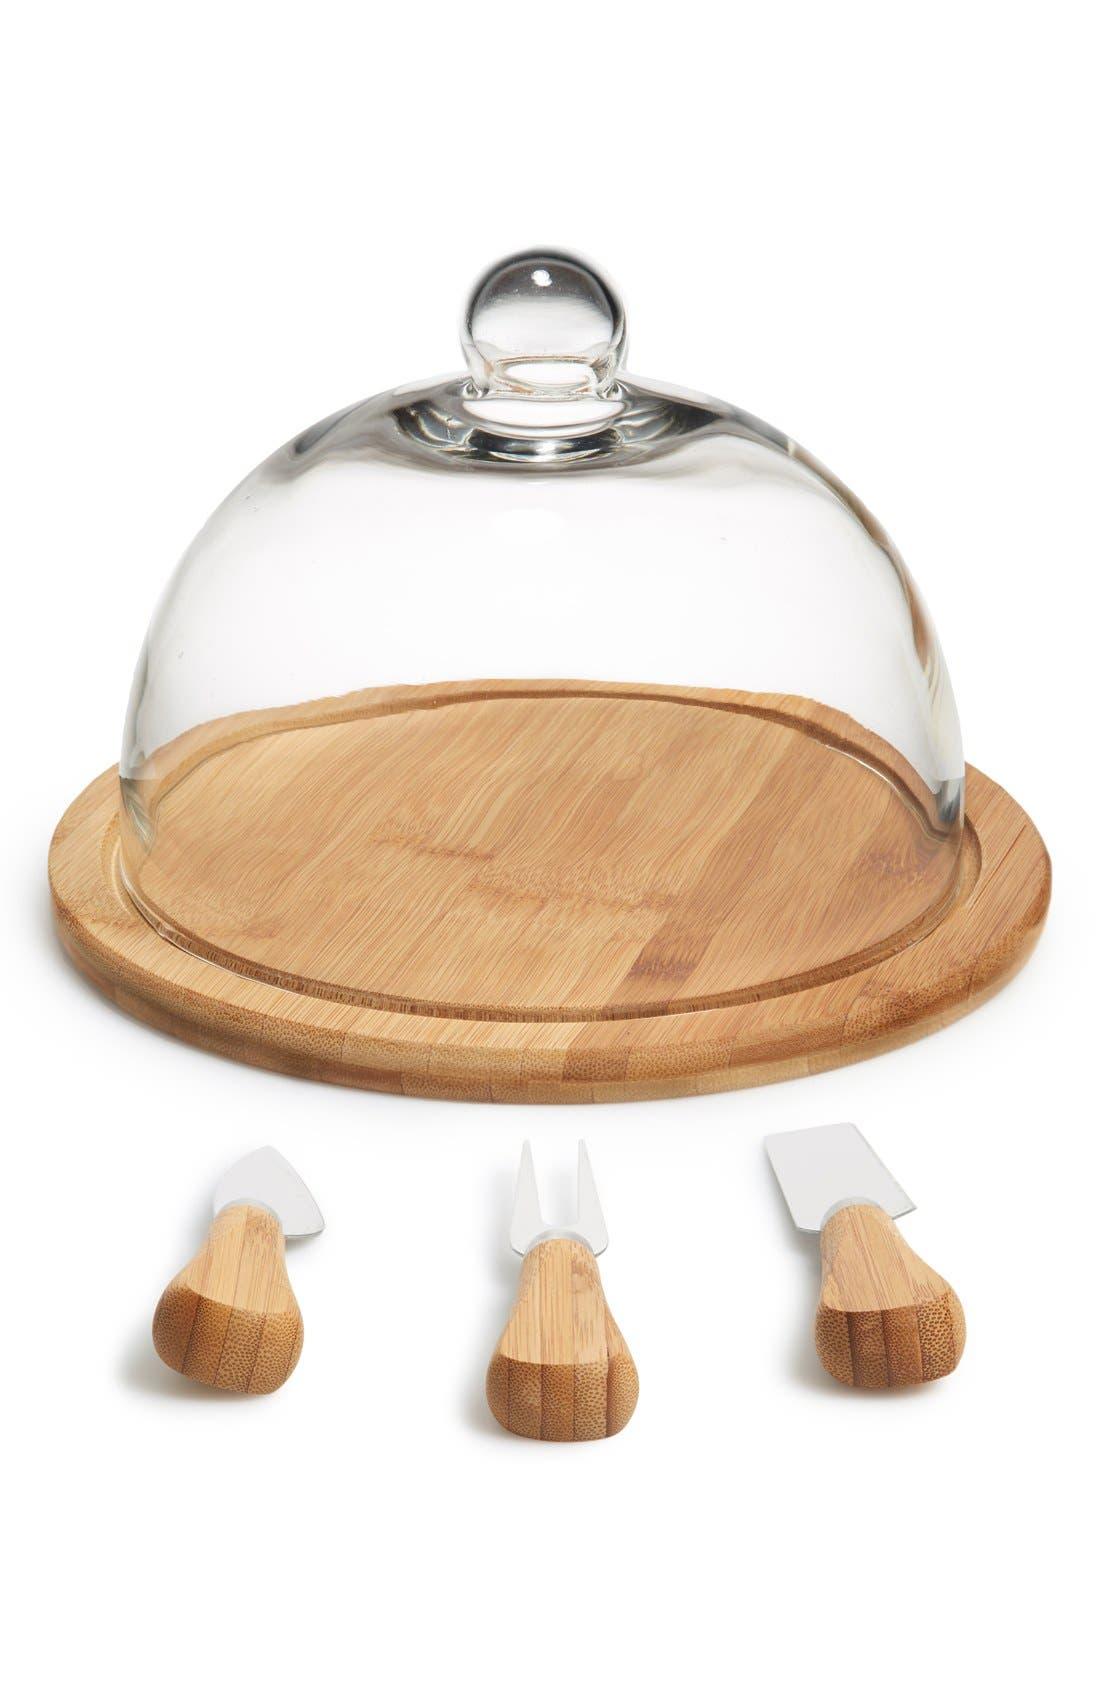 Main Image - Core Home Glass Dome Organic Bamboo Cheese Set